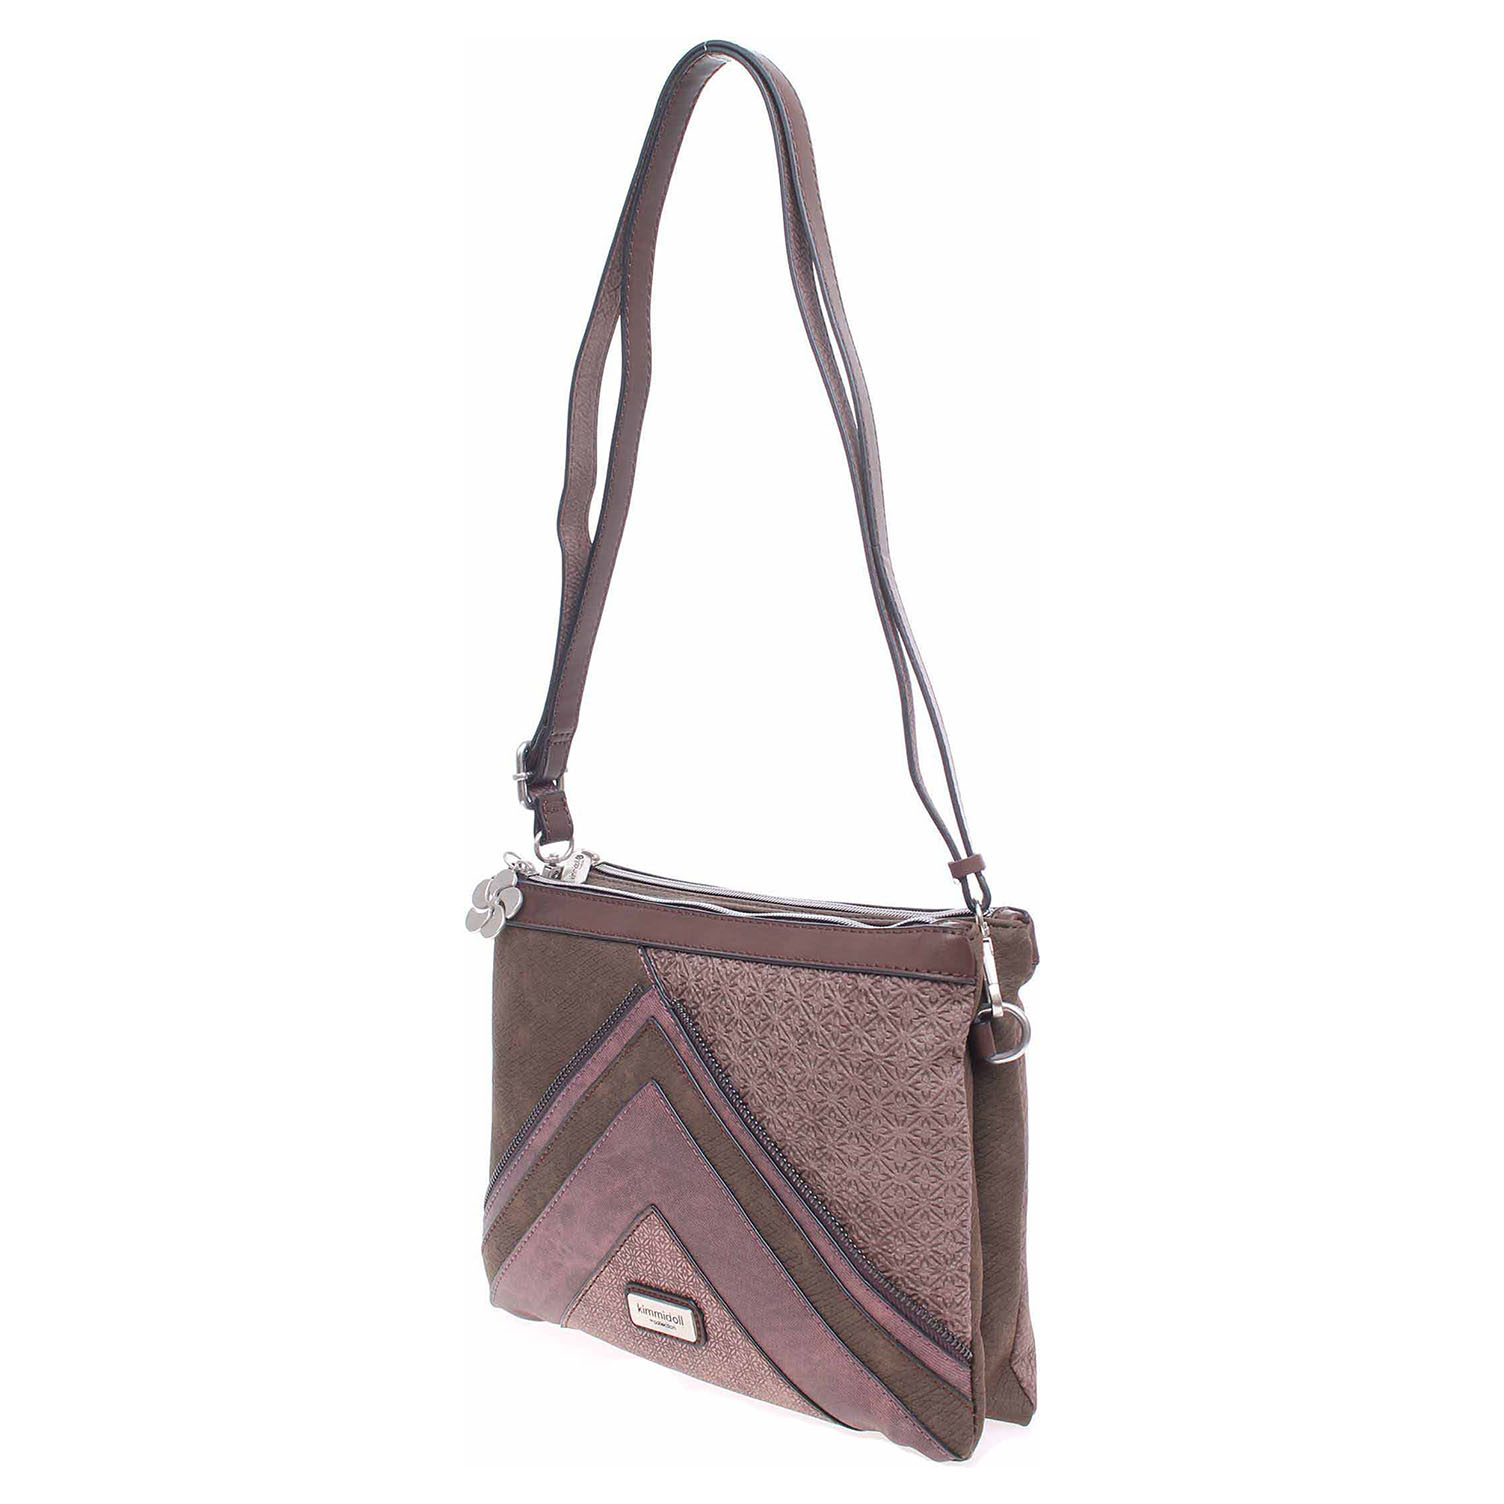 Ecco Kimmidoll dámská kabelka 25662-1 burdeos 11891317